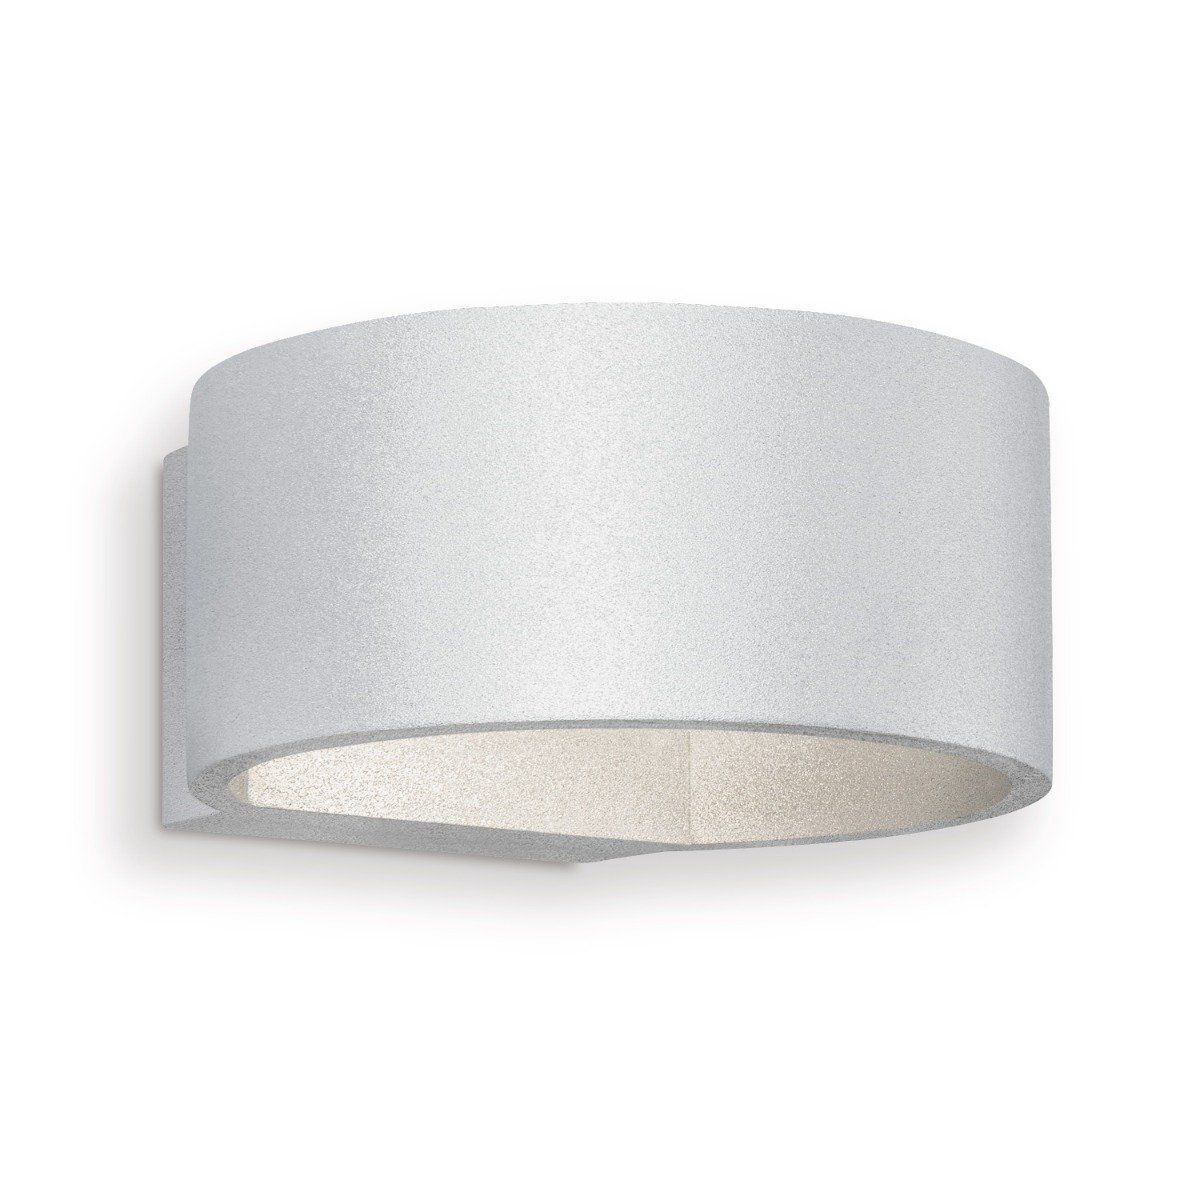 Home sweet home LED wandlamp Lounge � 13,4 cm - grijs